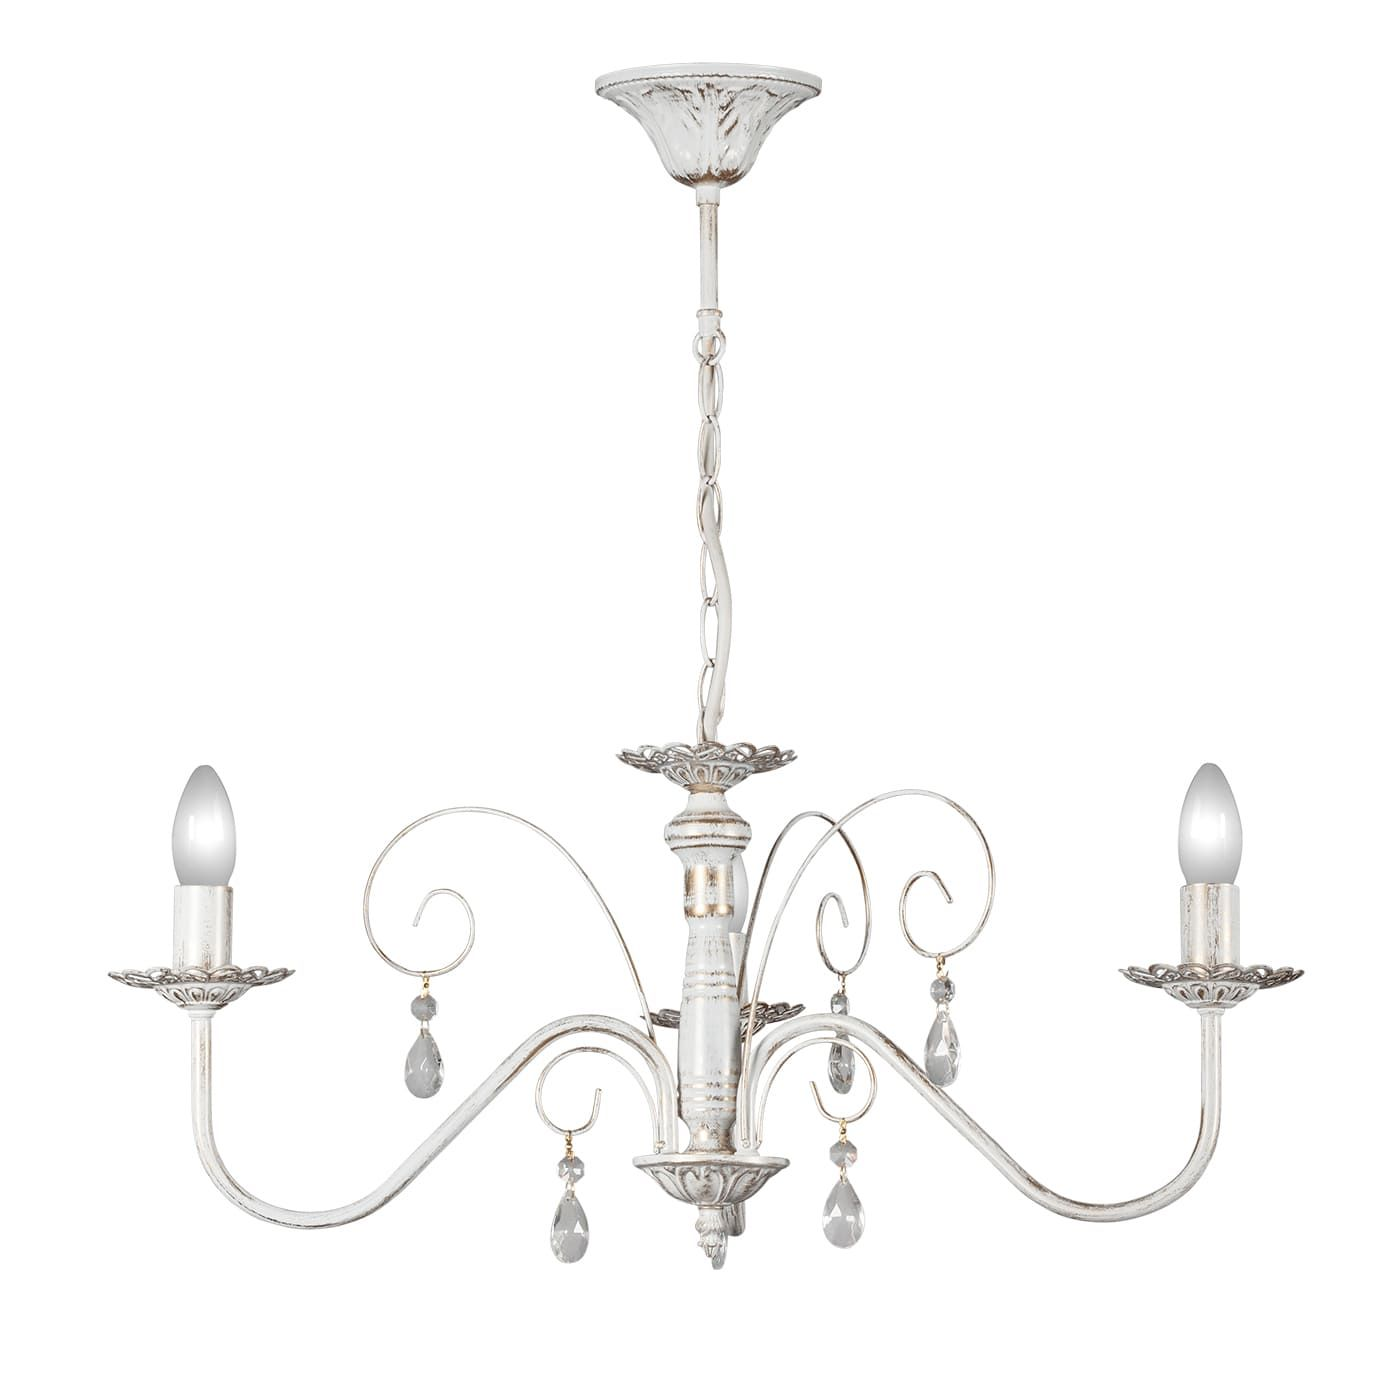 PETRASVET / Pendant chandelier S1018-3, 3xE14 max. 60W